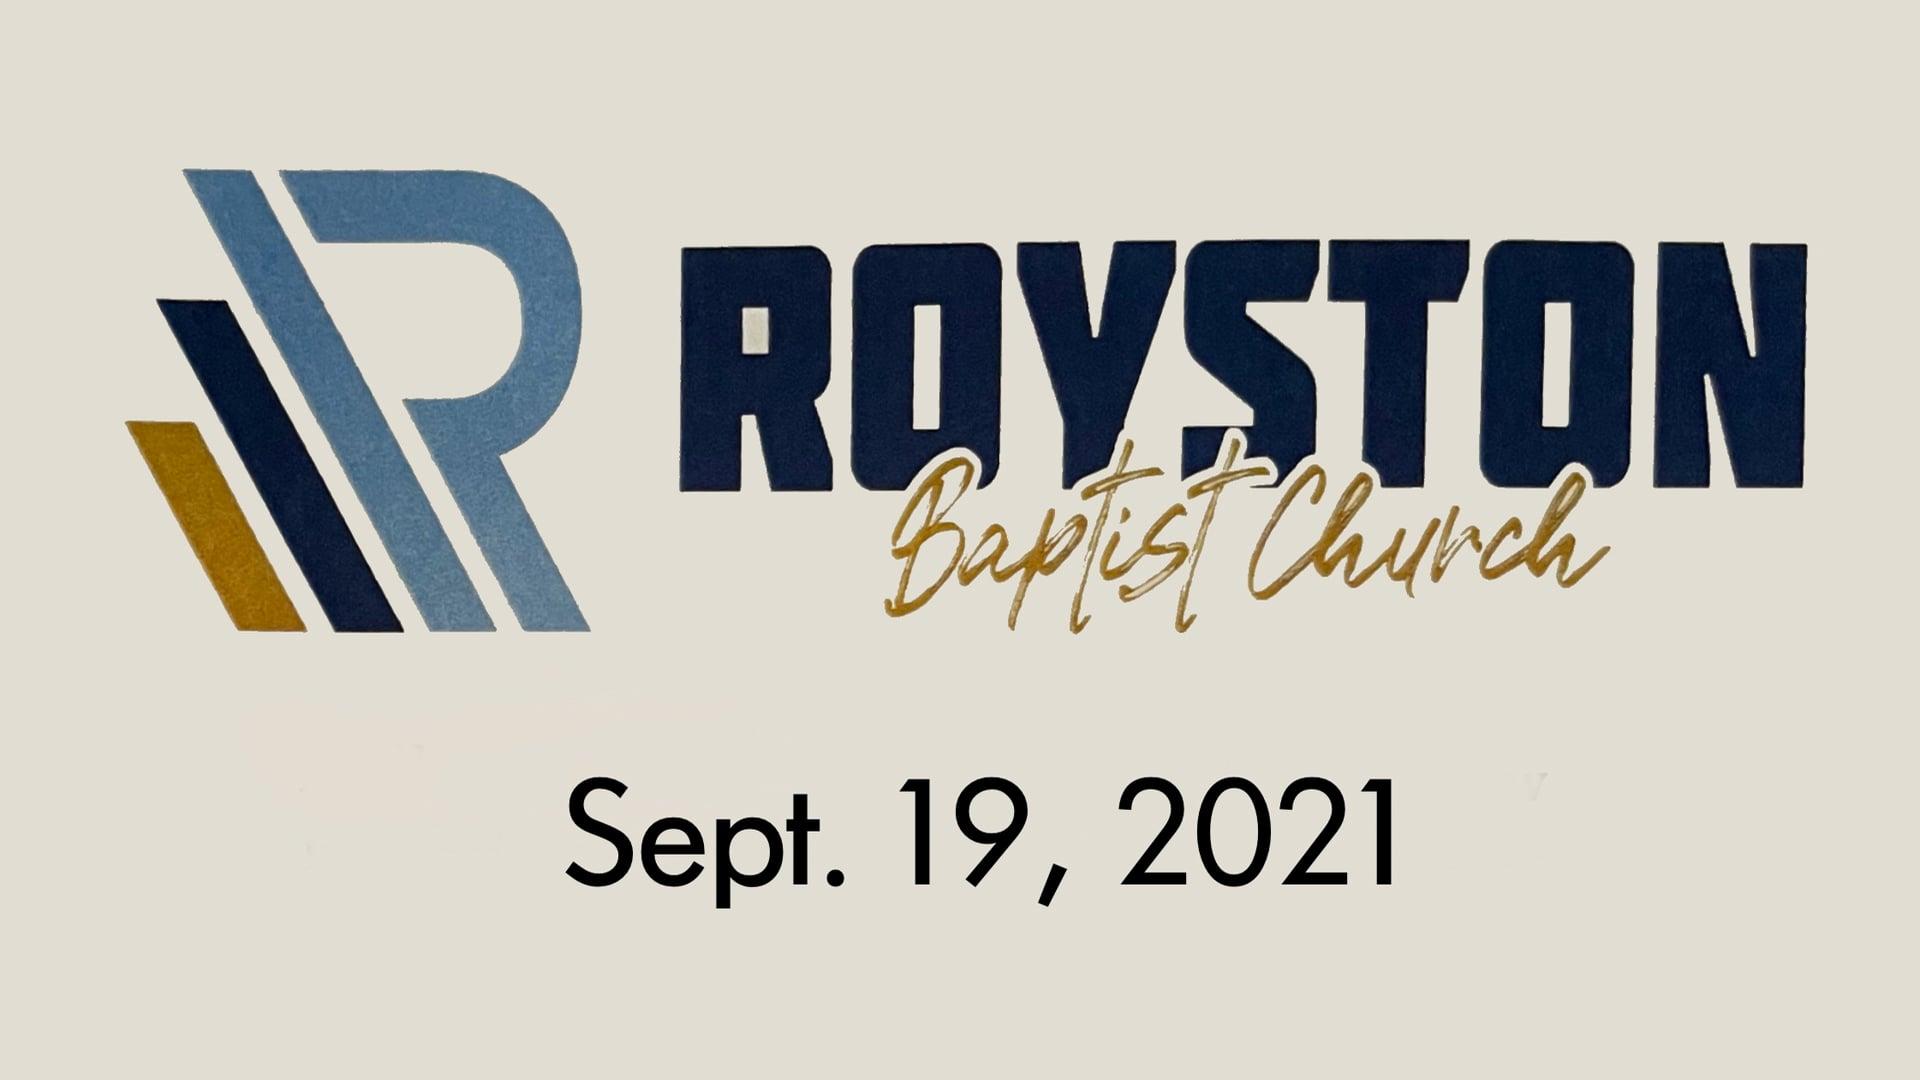 Royston Baptist Church 11 AM Worship Service Message for Sept. 19, 2021